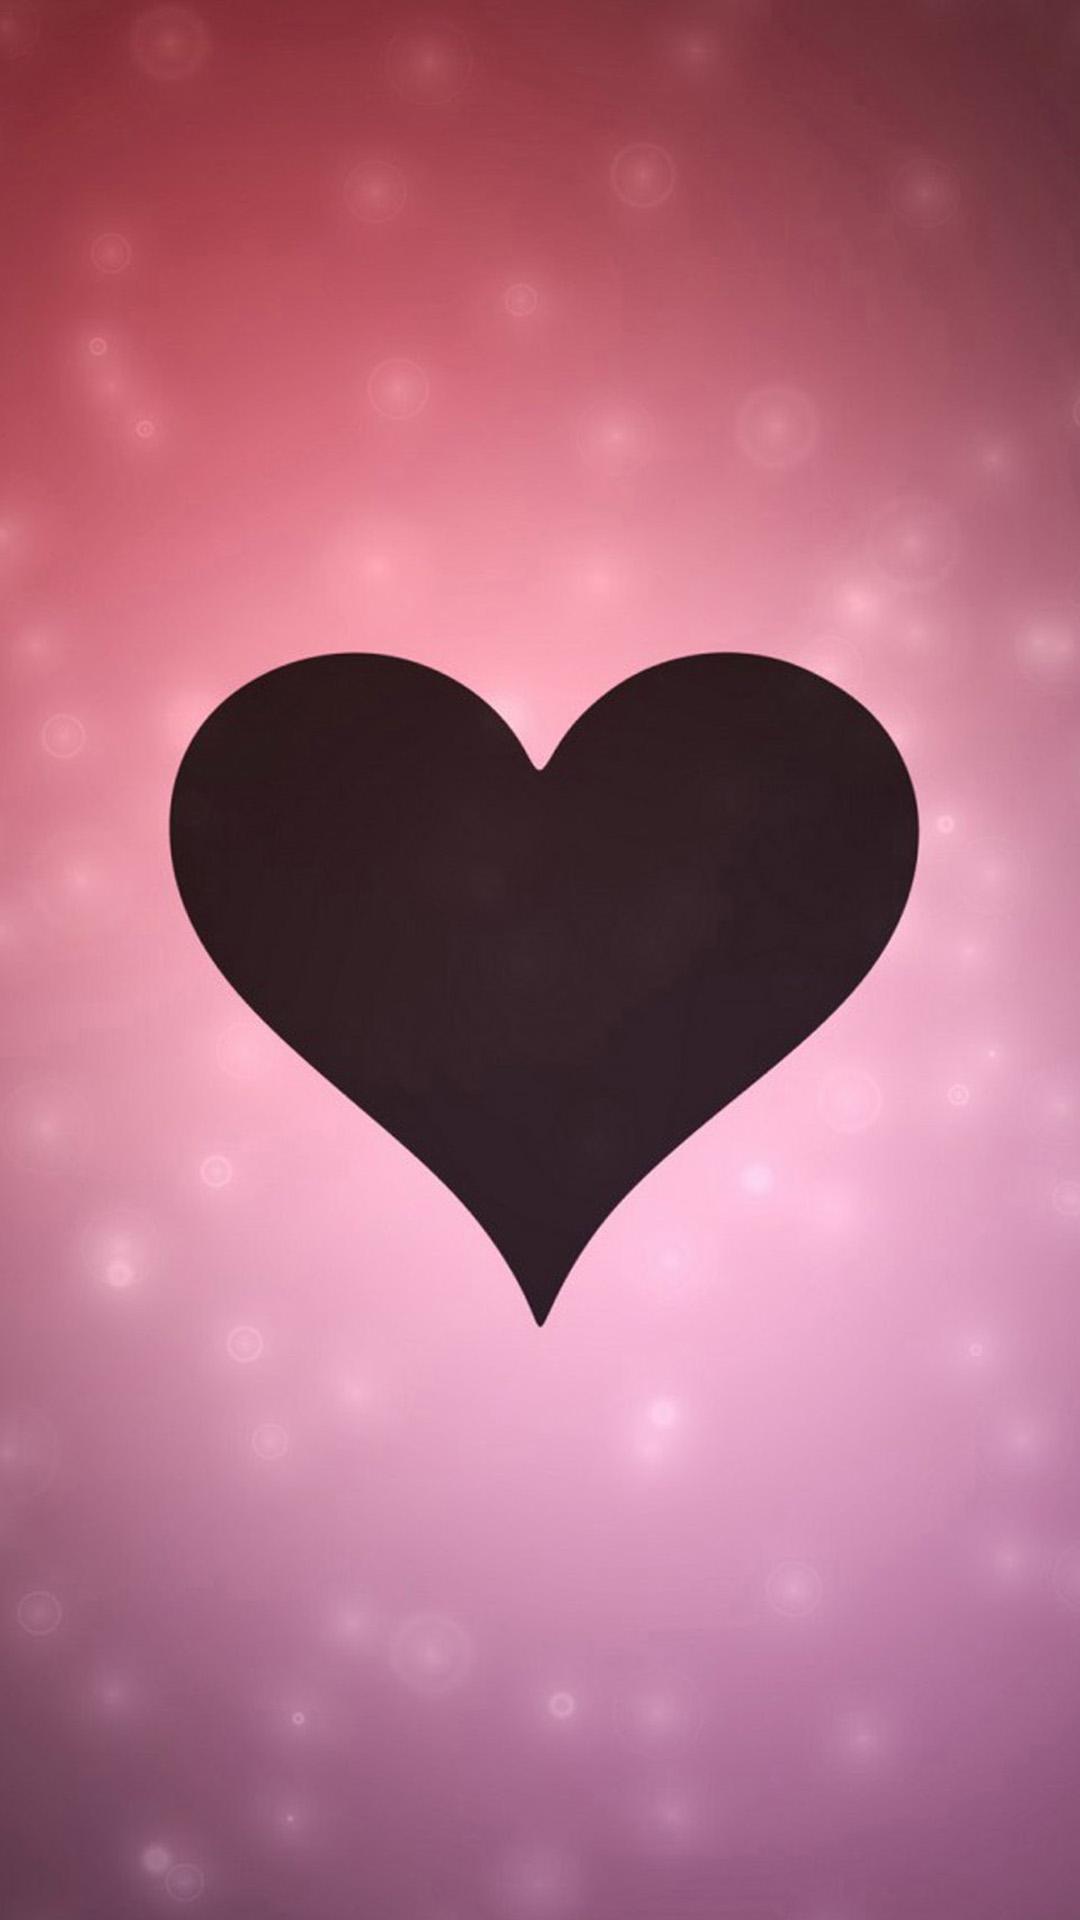 Heart Wallpaper Love